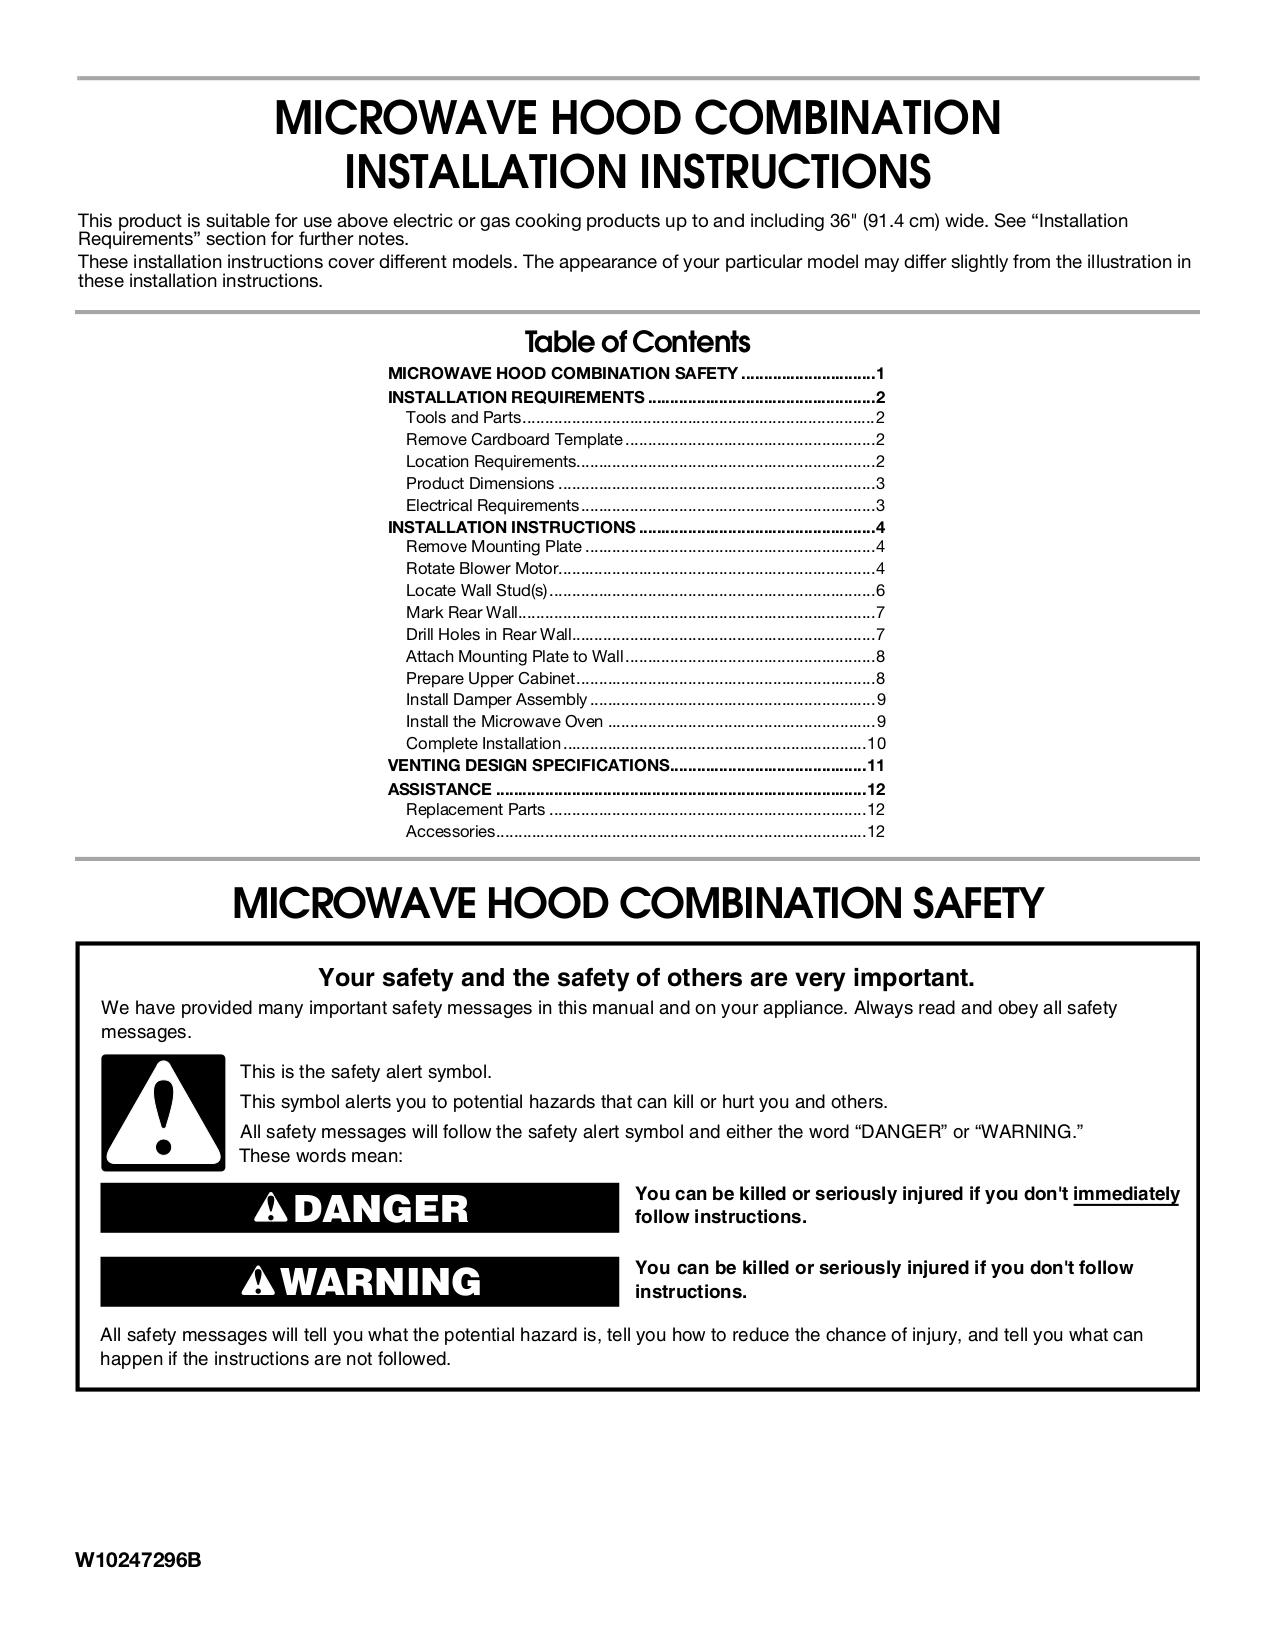 whirlpool microwave instructions manual rh whirlpool microwave instructions manual tempo